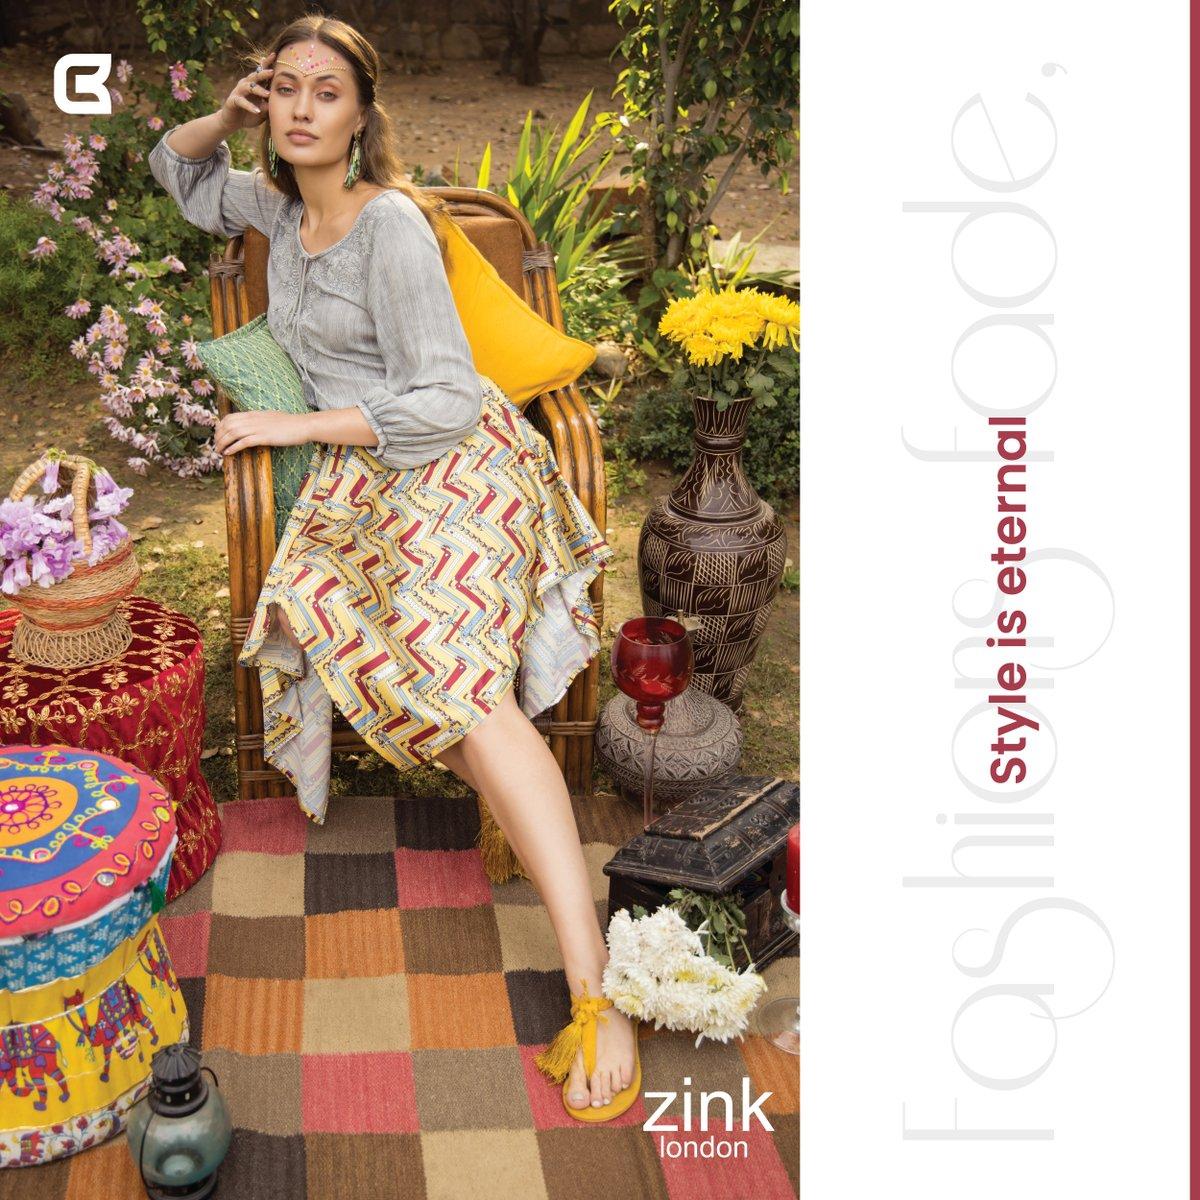 Get the best comfort in your SS20. #BLUECLUB #Rajkot #comfortable #springsummer2020 #Fashionista #rangilurajkot #traveldiaries #love #beautiful #fashion #iphonesia #summercollection #staytuned #StayStylish